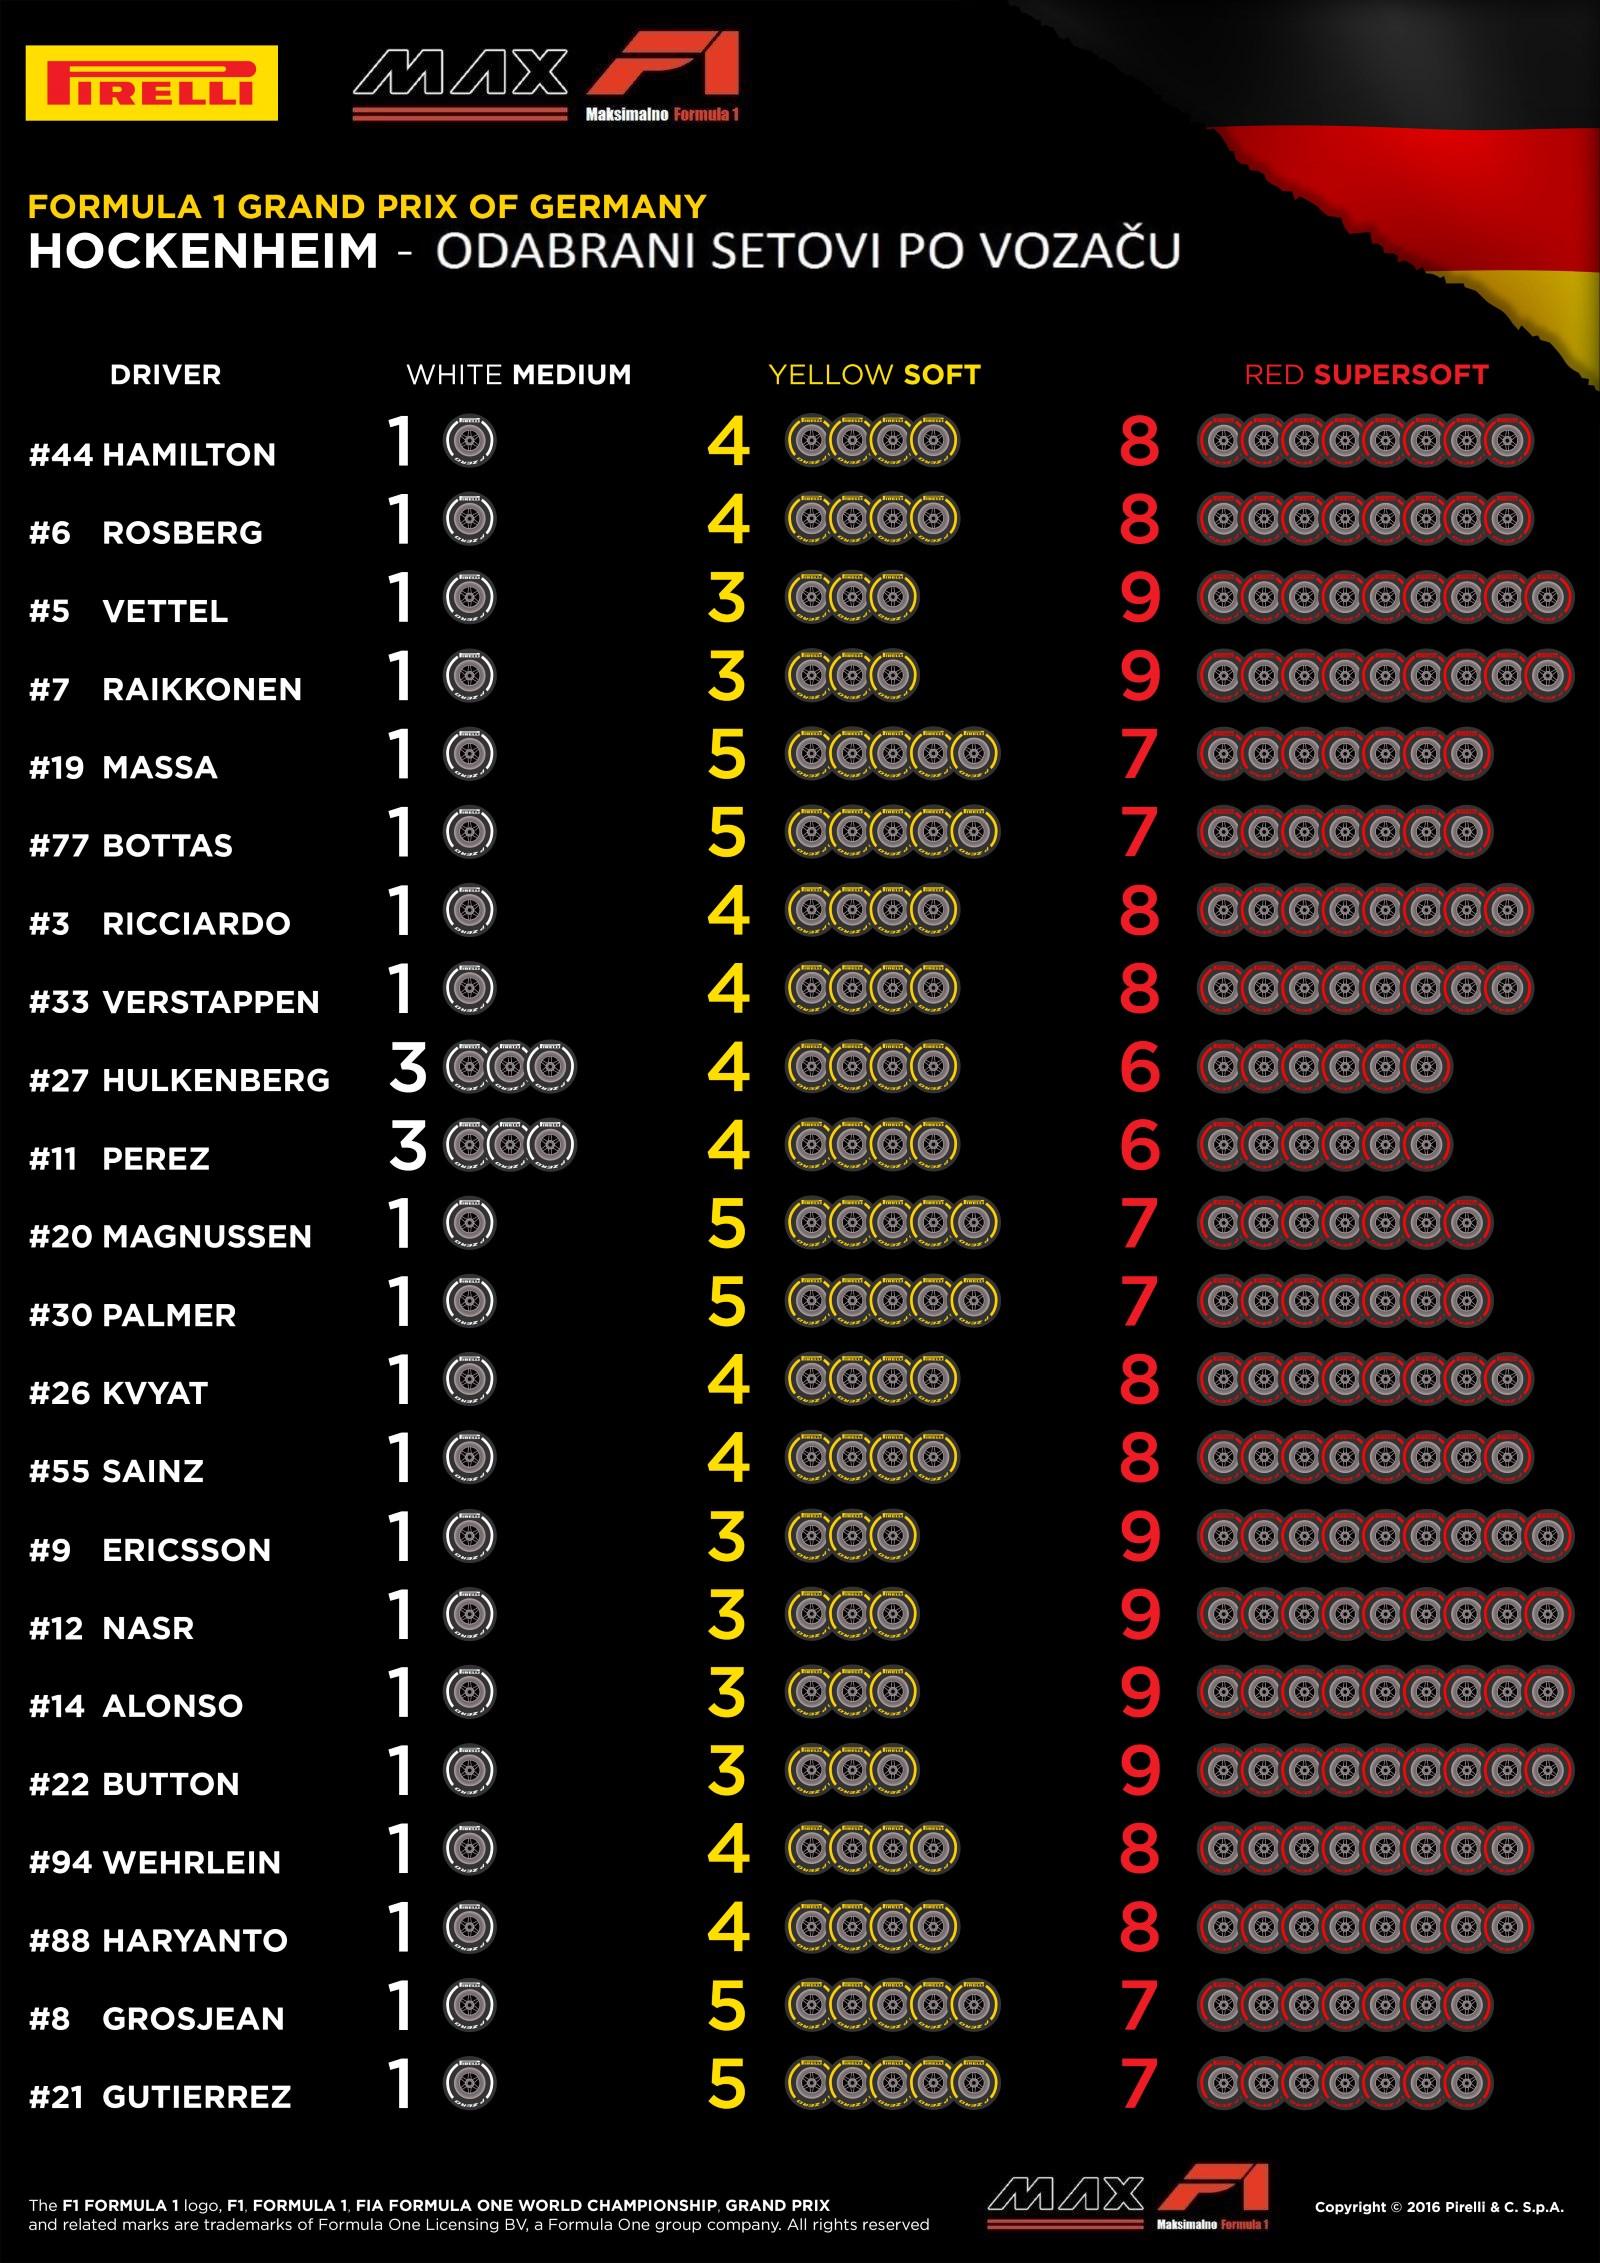 Pirelli F1 German GP F1 2016 selected sets per driver croatian translation